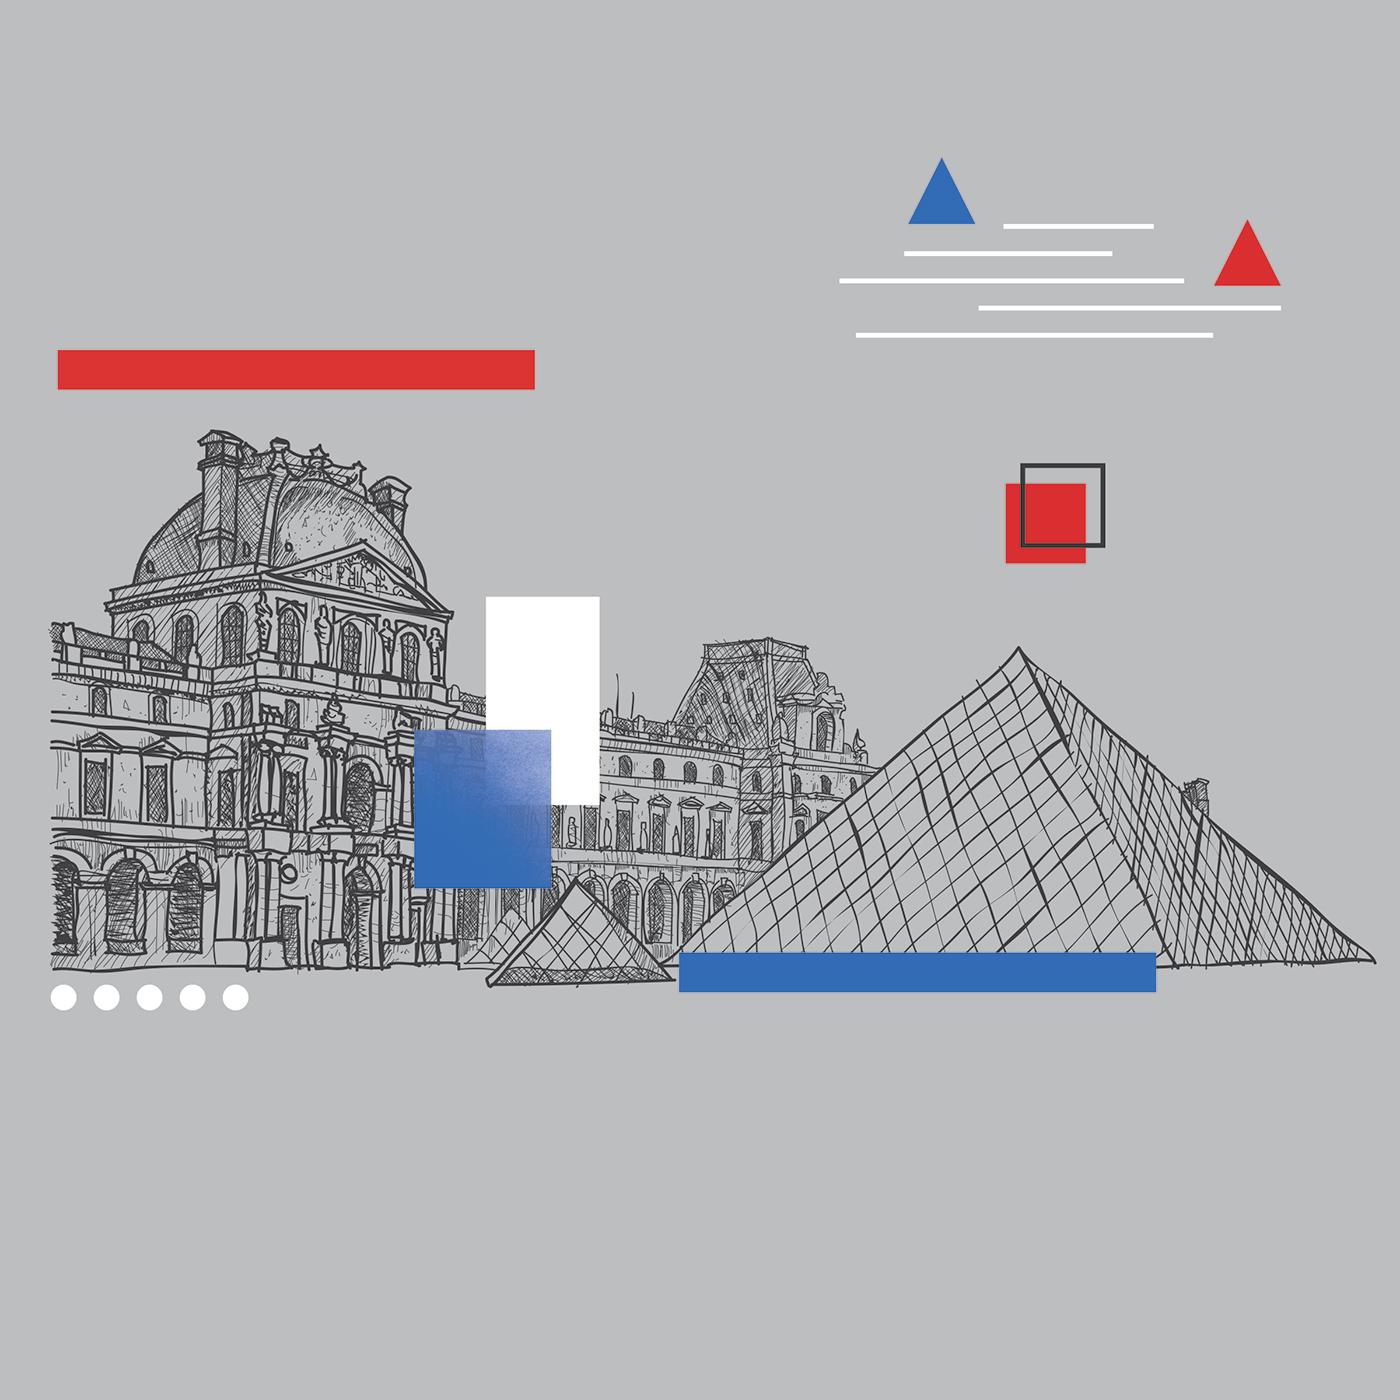 Architecture X Memphis Design (Digital Illustration) on Behance